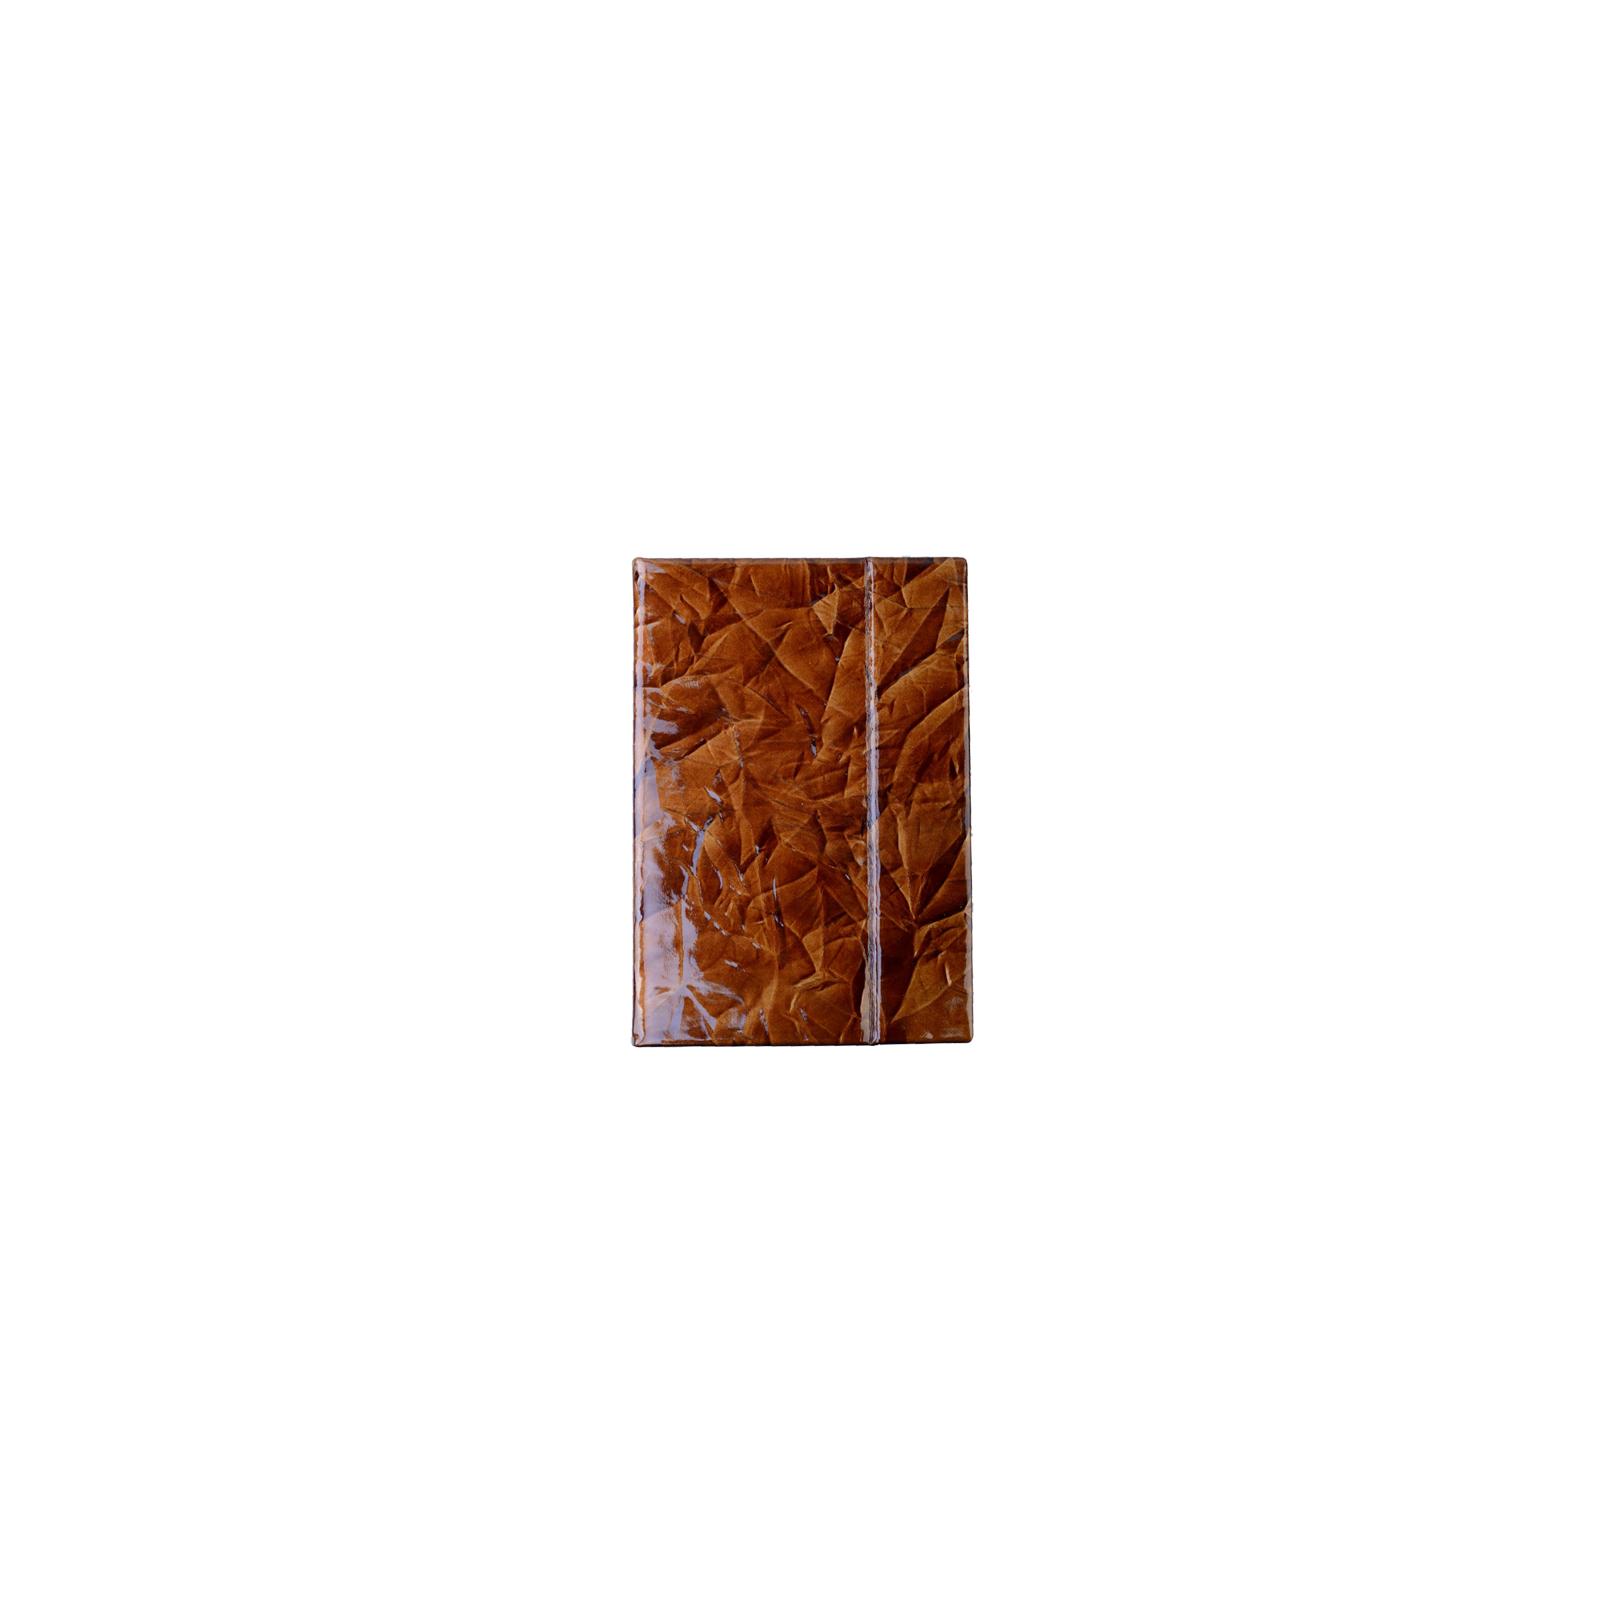 Чехол для планшета Vento 9 Desire glossy -brown lacotte изображение 2